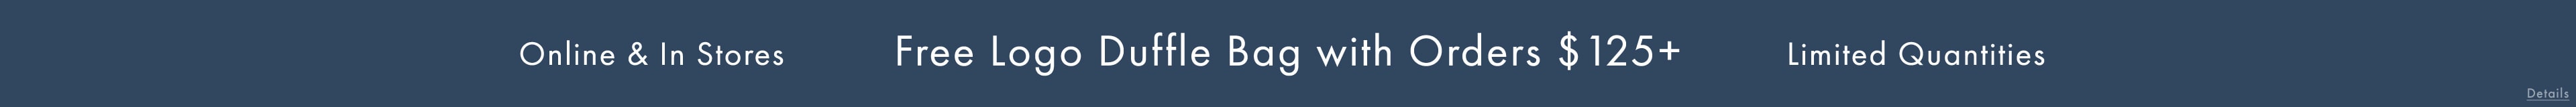 Free Logo Duffle Bag